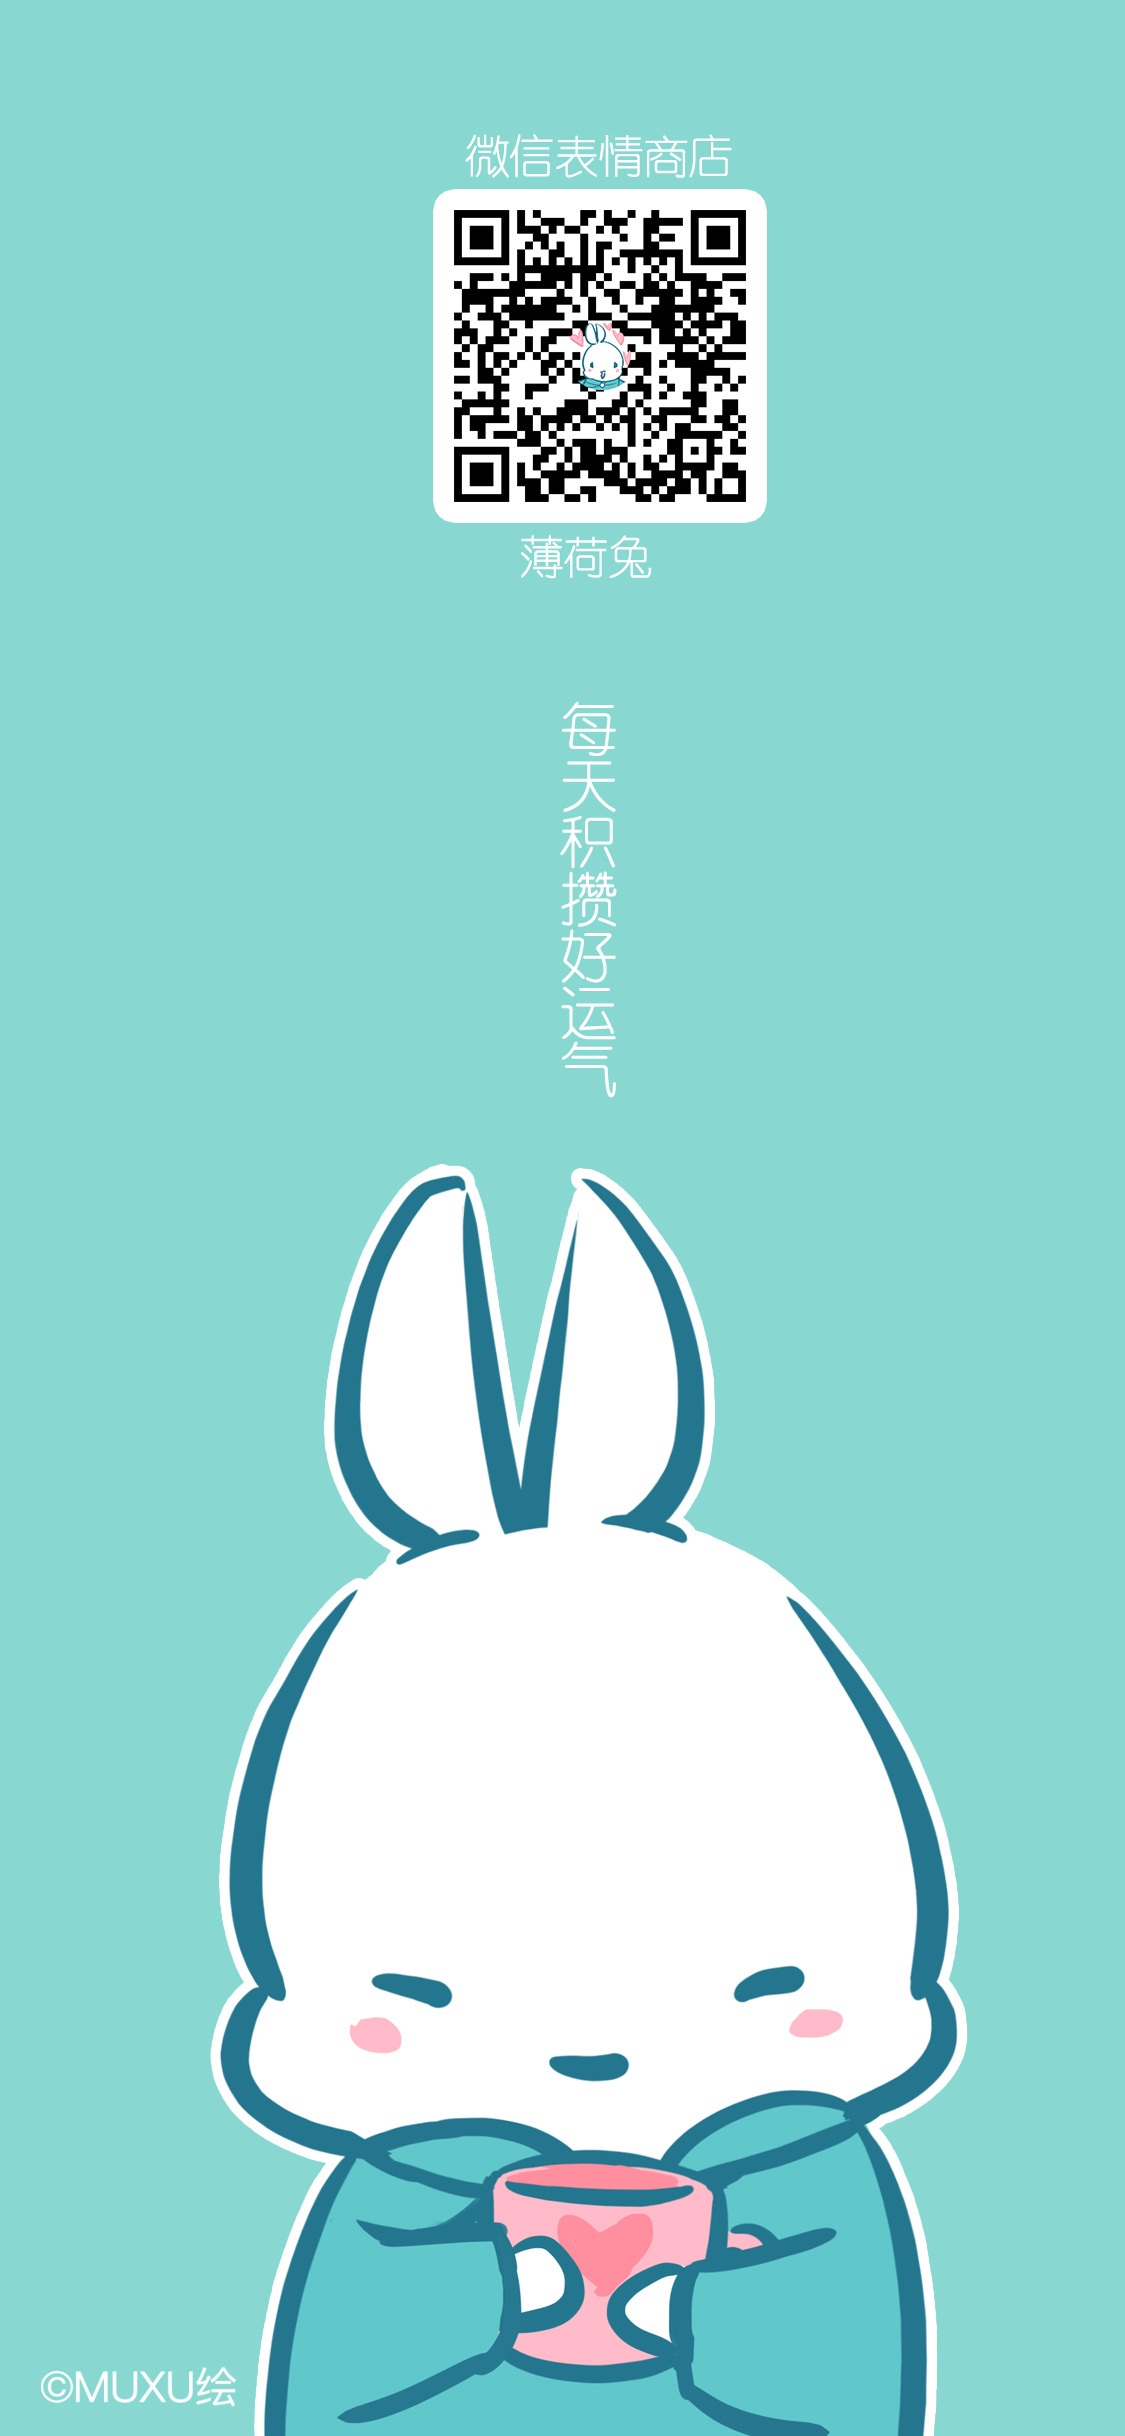 muxusunny_薄荷兔 动漫 网络表情 muxu绘 - 原创作品 - 站酷